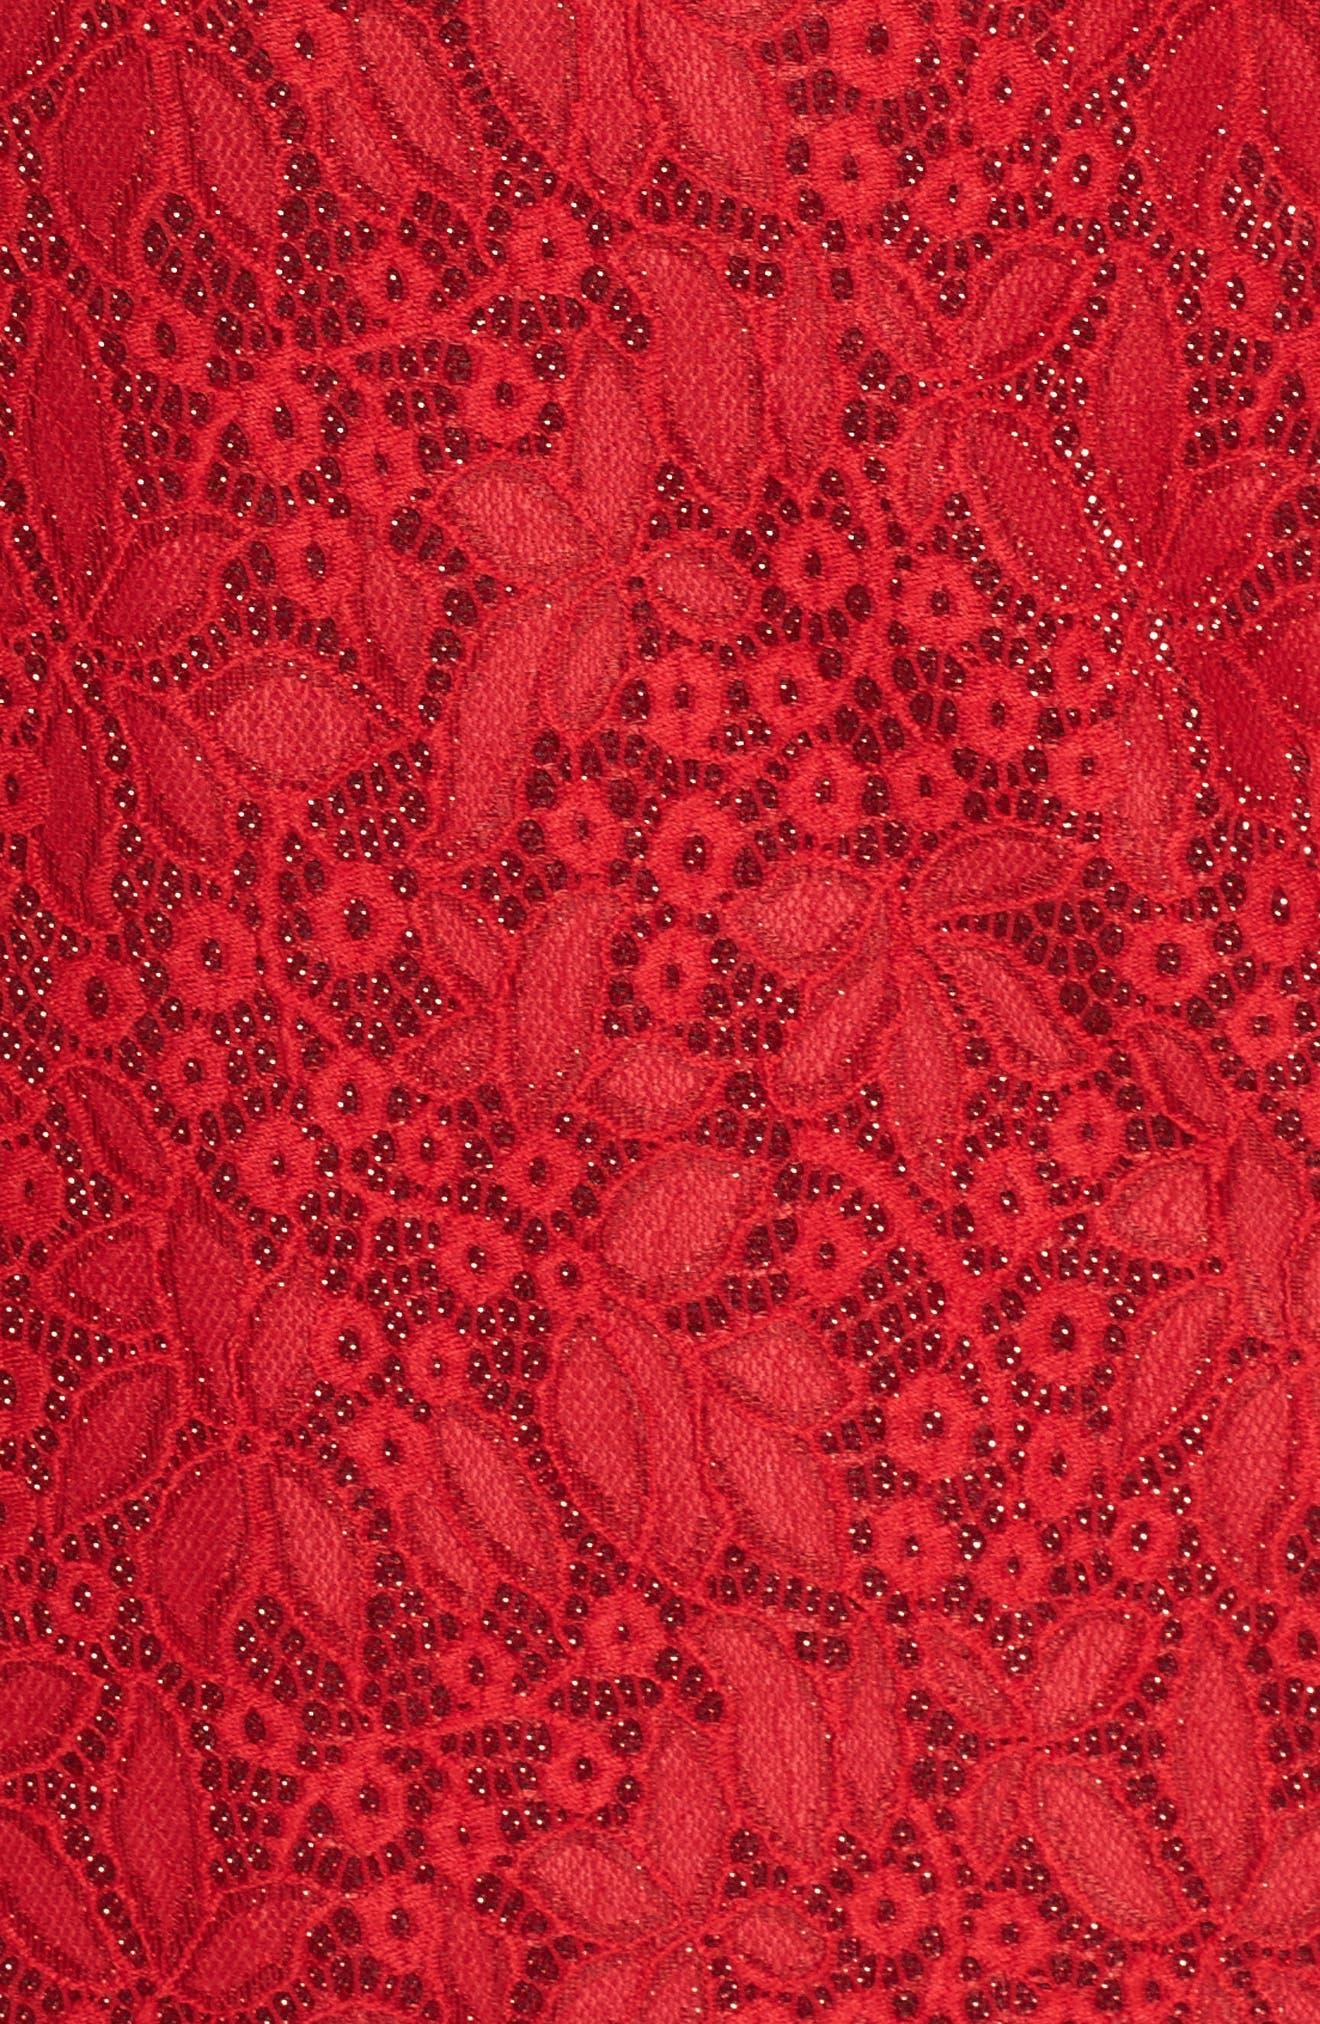 Shimmer Lace Sheath Dress,                             Alternate thumbnail 5, color,                             620